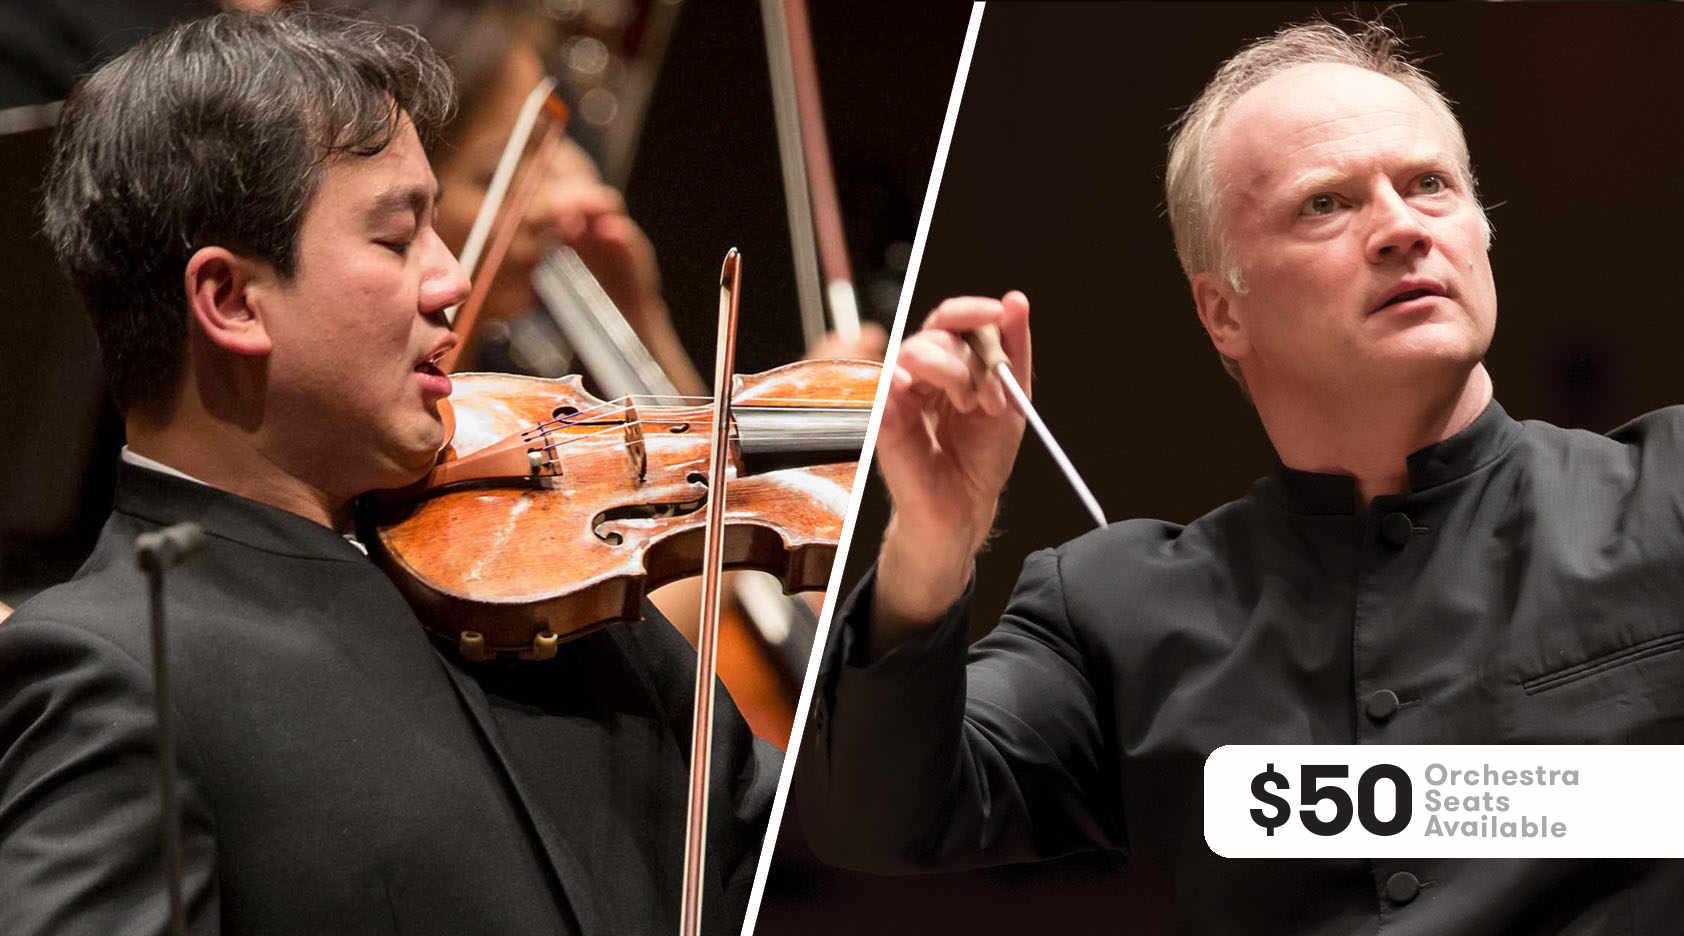 Saint-Saëns and Rachmaninoff